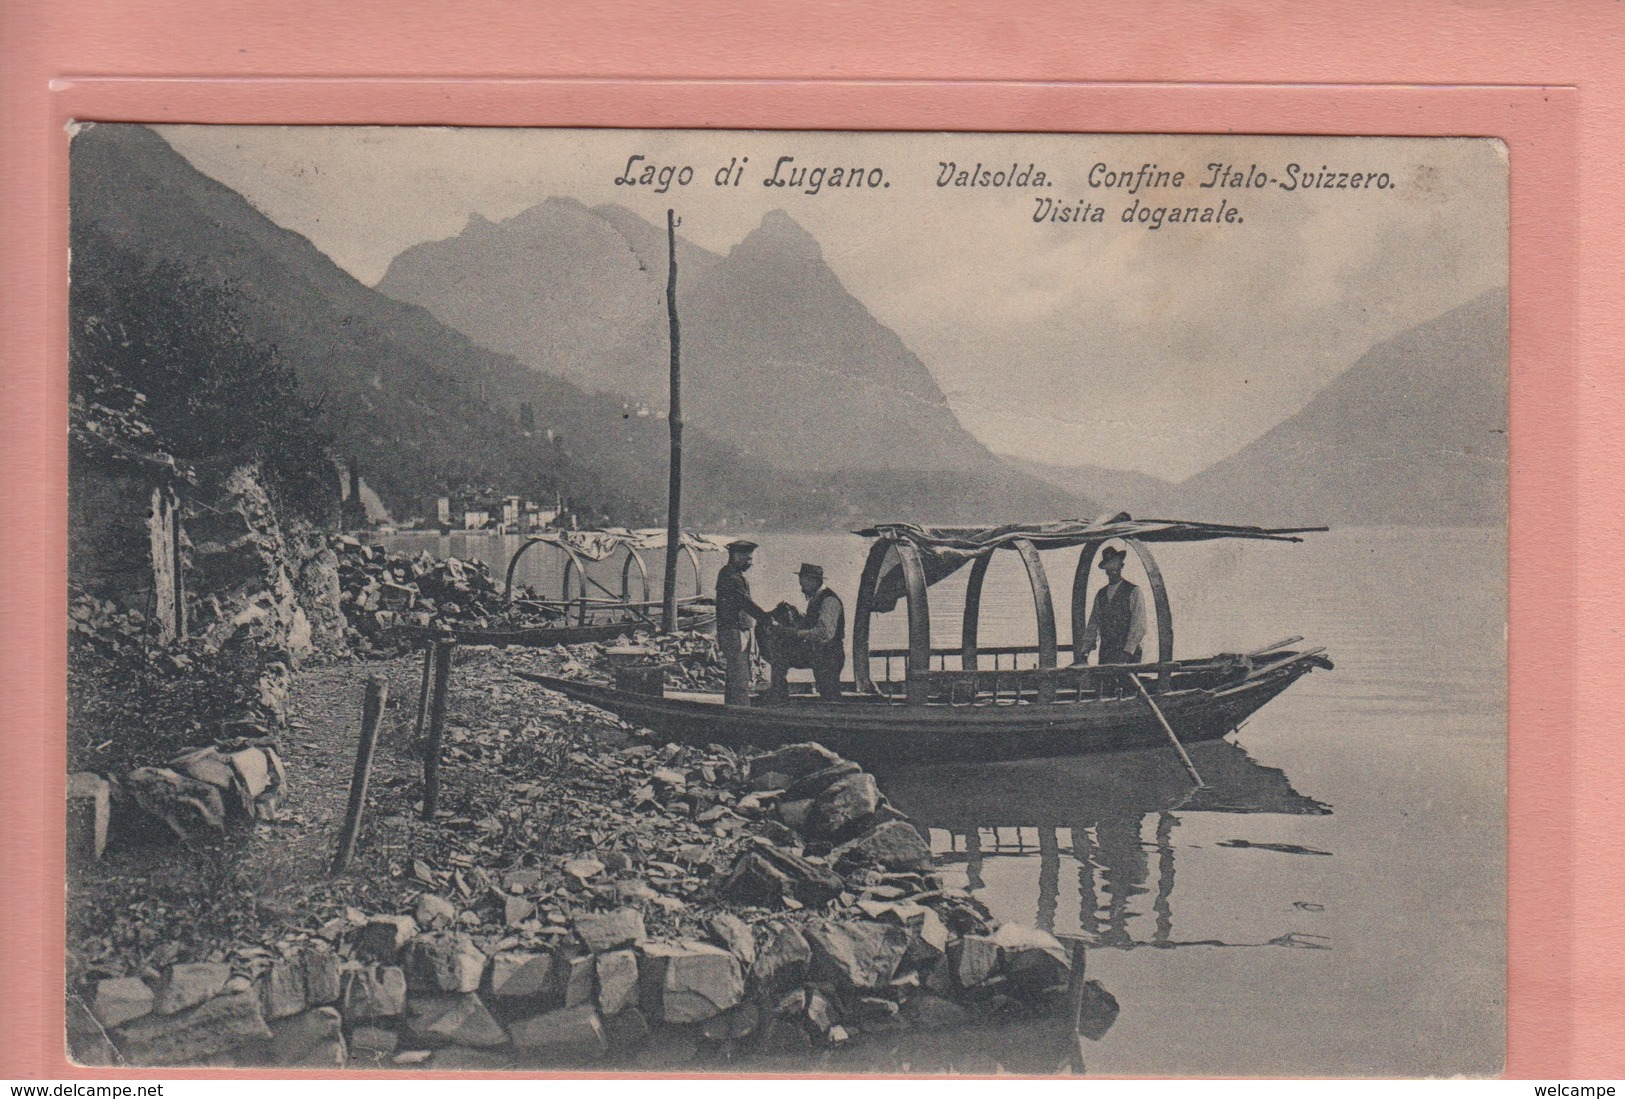 OUDE POSTKAART ZWITSERLAND - SCHWEIZ -  SVIZZERA - LAG DI LUGANO - VISITA DOGANALE - TI Ticino